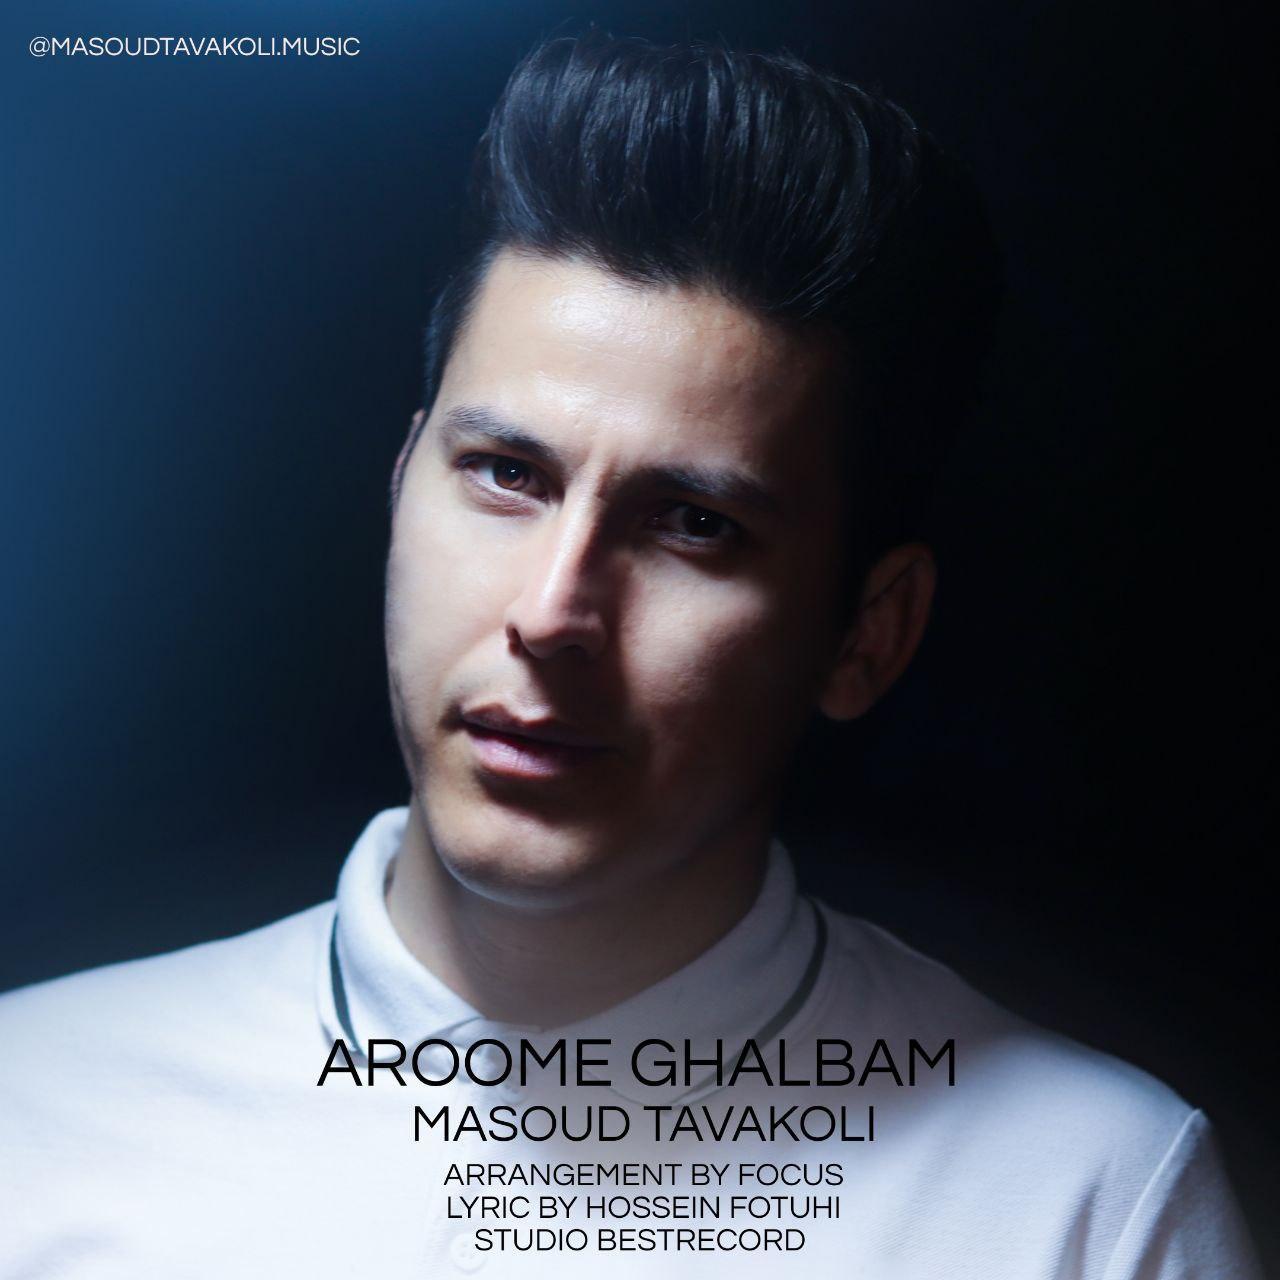 Masoud Tavakoli – Aroome Ghalbam